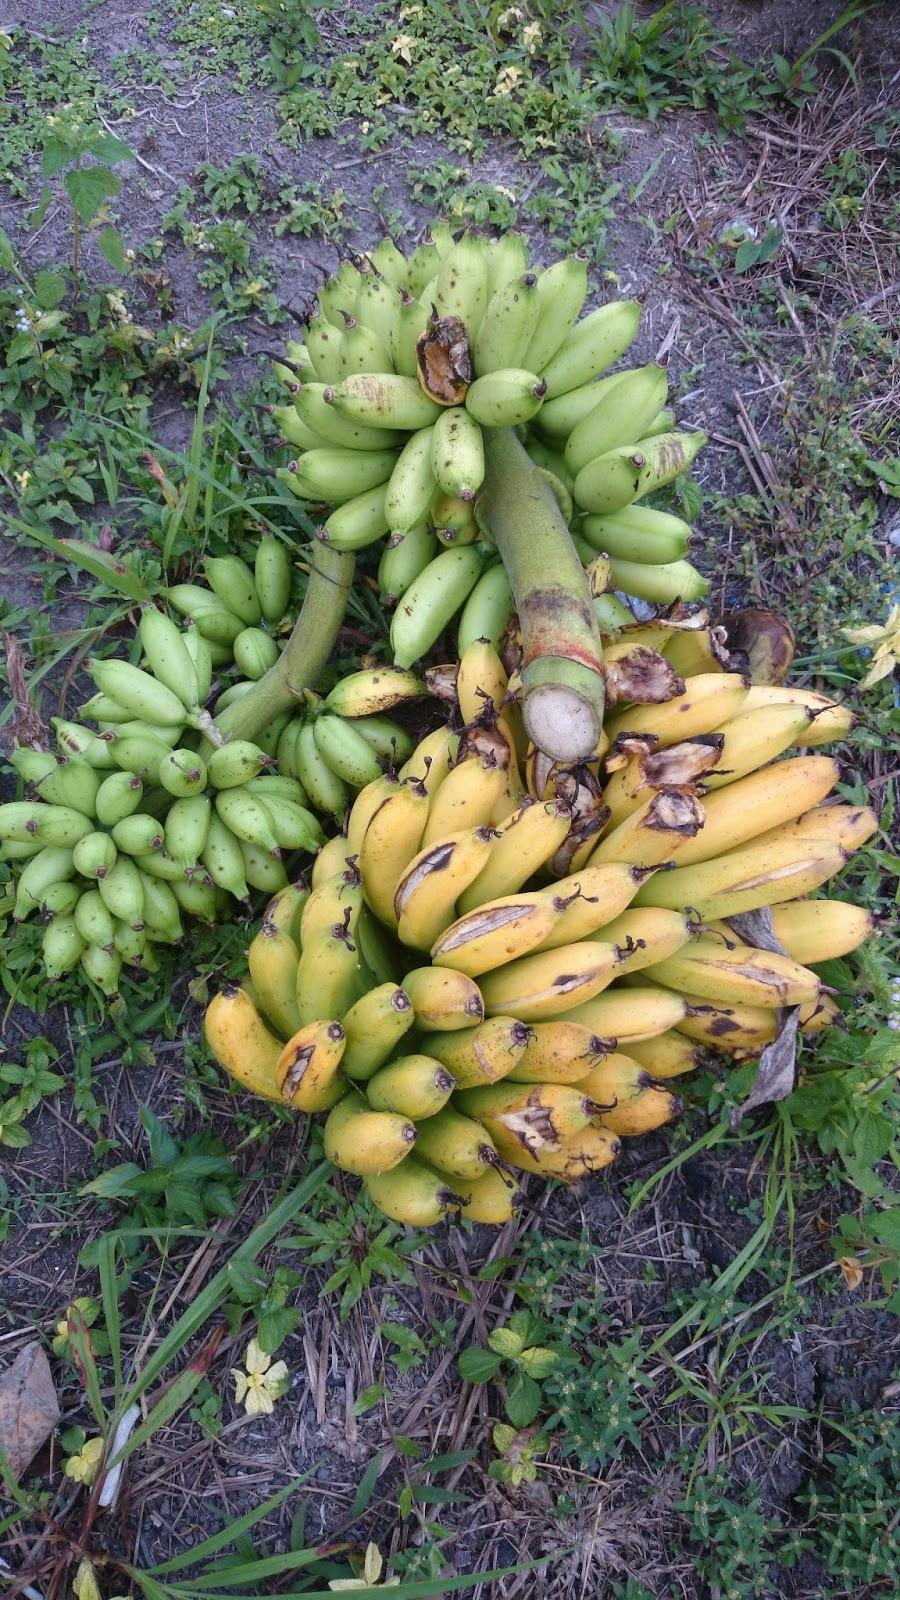 Tuaian Sayuran Dan Buah Pertengahan Tahun Di Kg Kebun Getah Bawang Dayak Segar Setengah Kilo Beginilah Hidup Berjiran Berkongsi Dengan Hidupan Sini Nasib Kawanan Monyet Belum Ke Mari Jika Ya Habis Pisang Ini Tanpa Meninggalkan Sebiji Dua